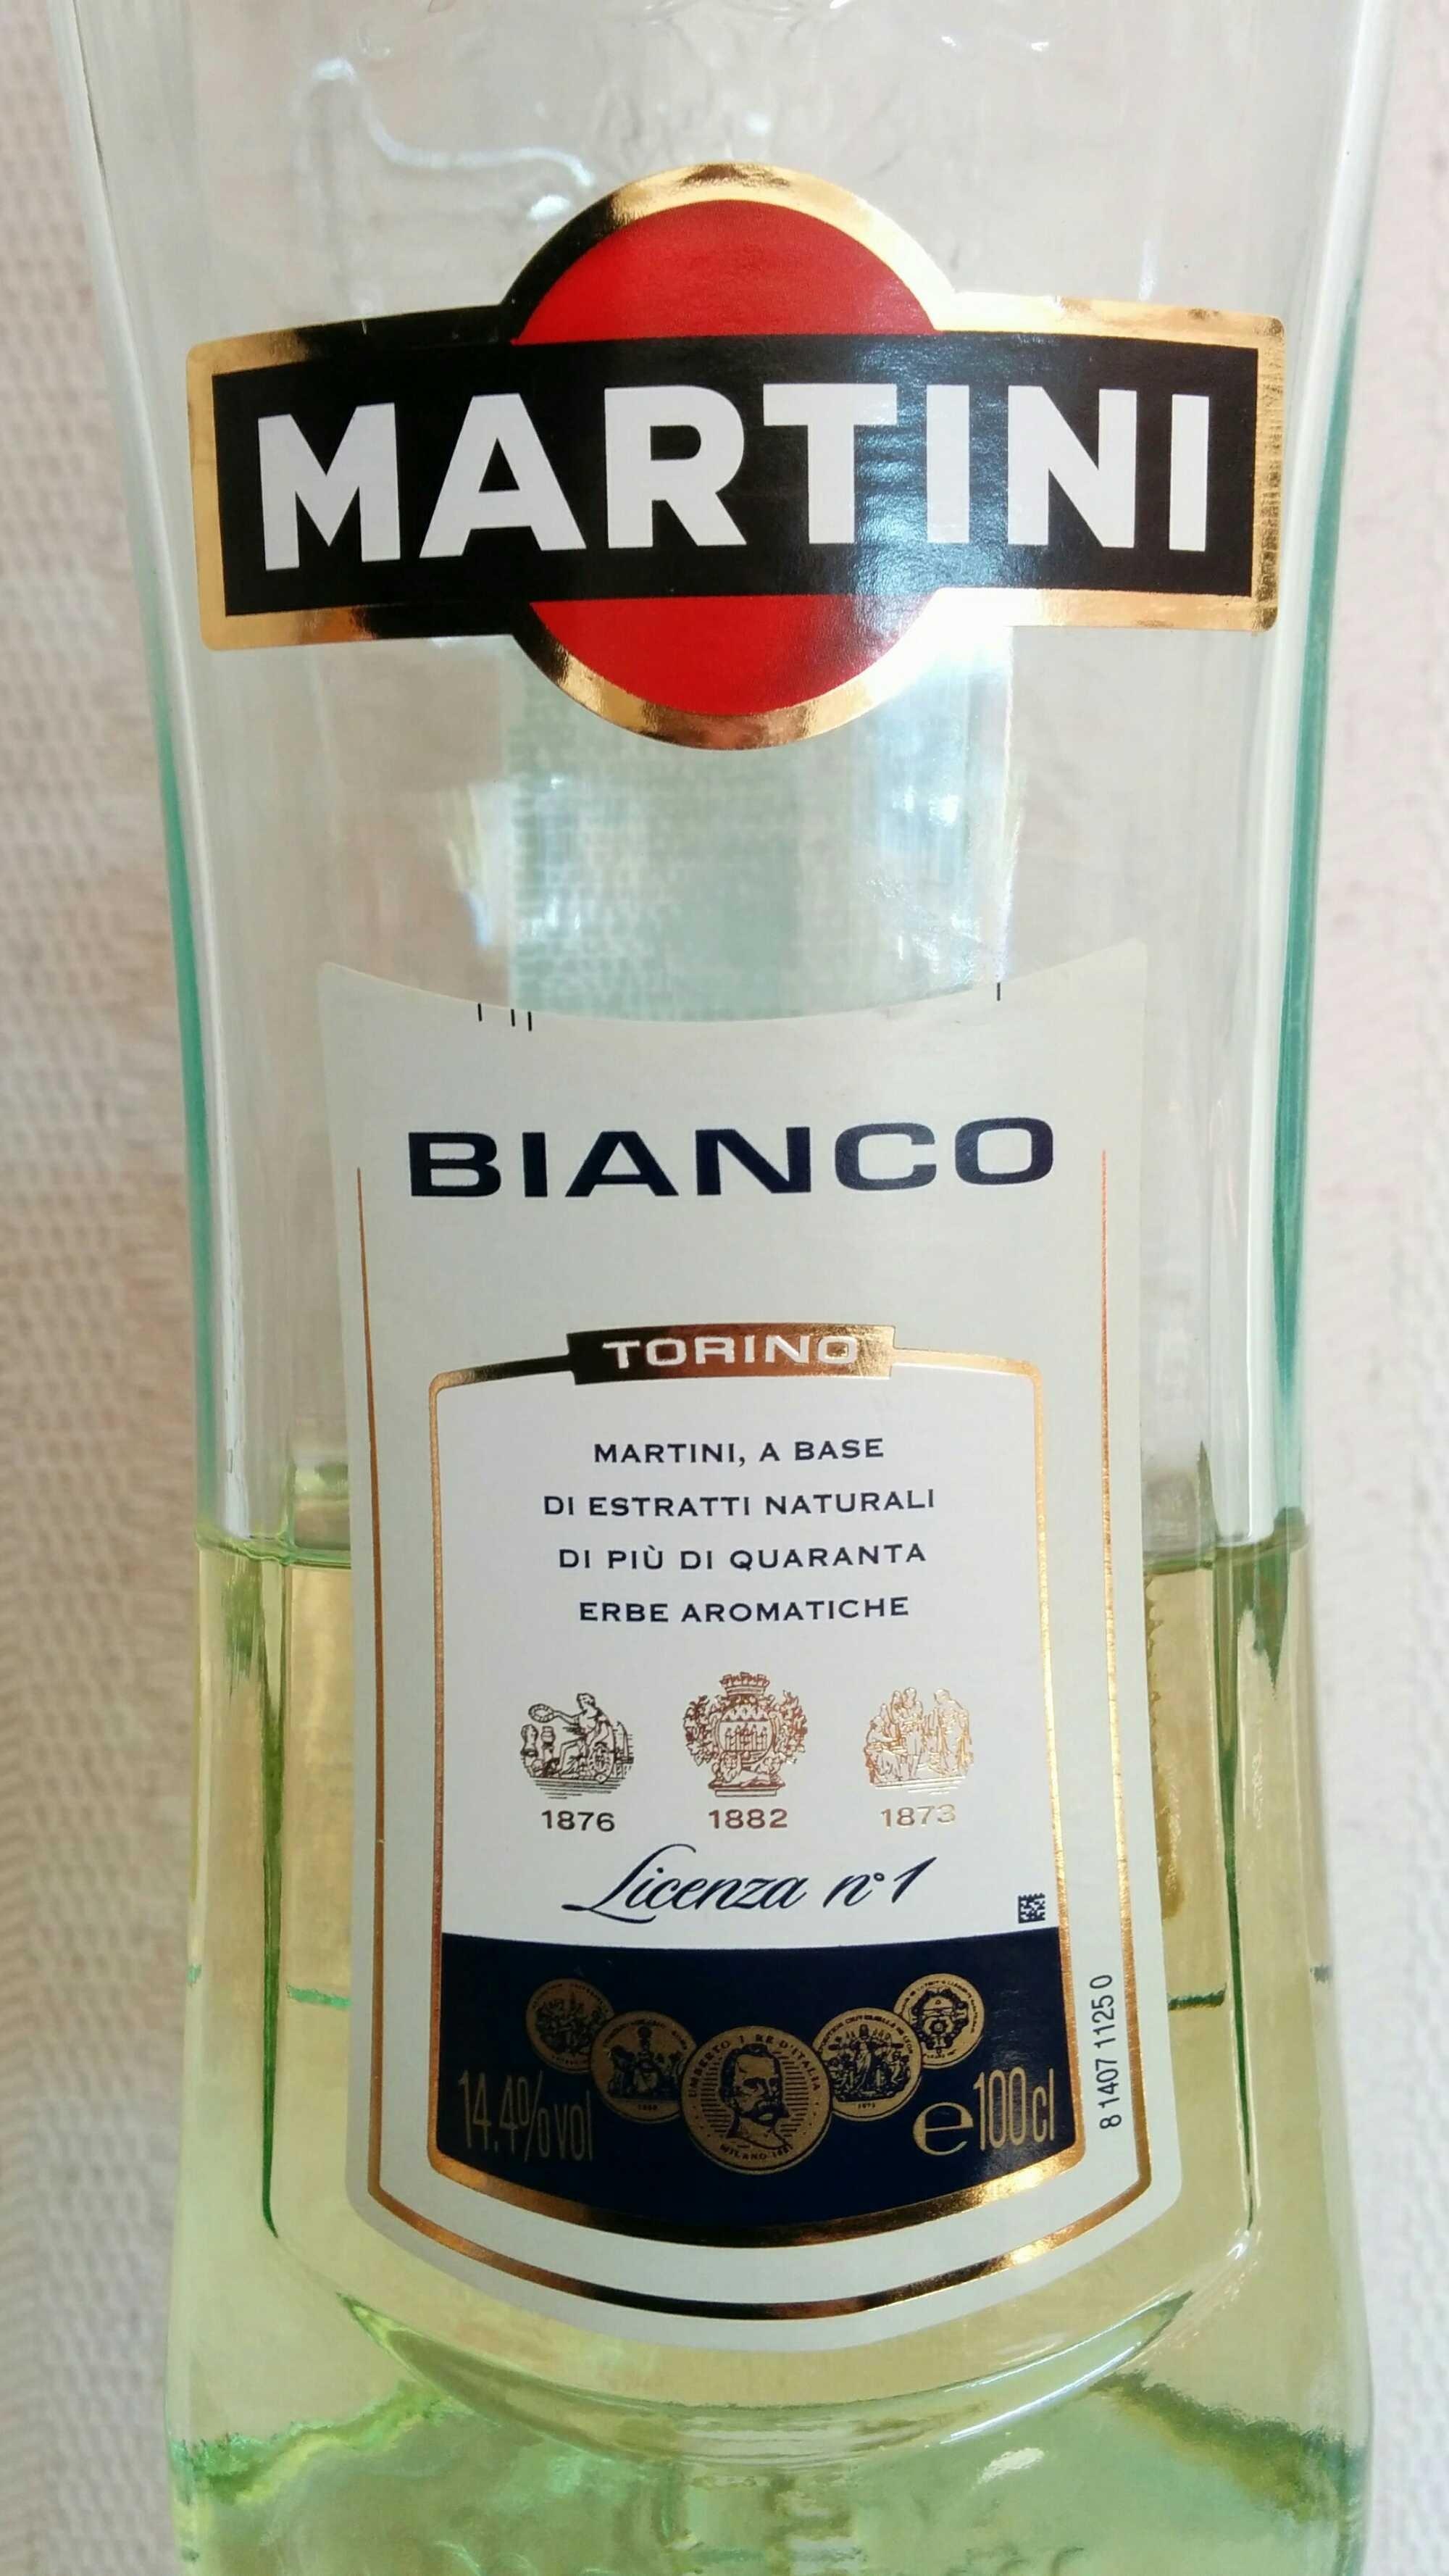 Martini bianco torino drinks